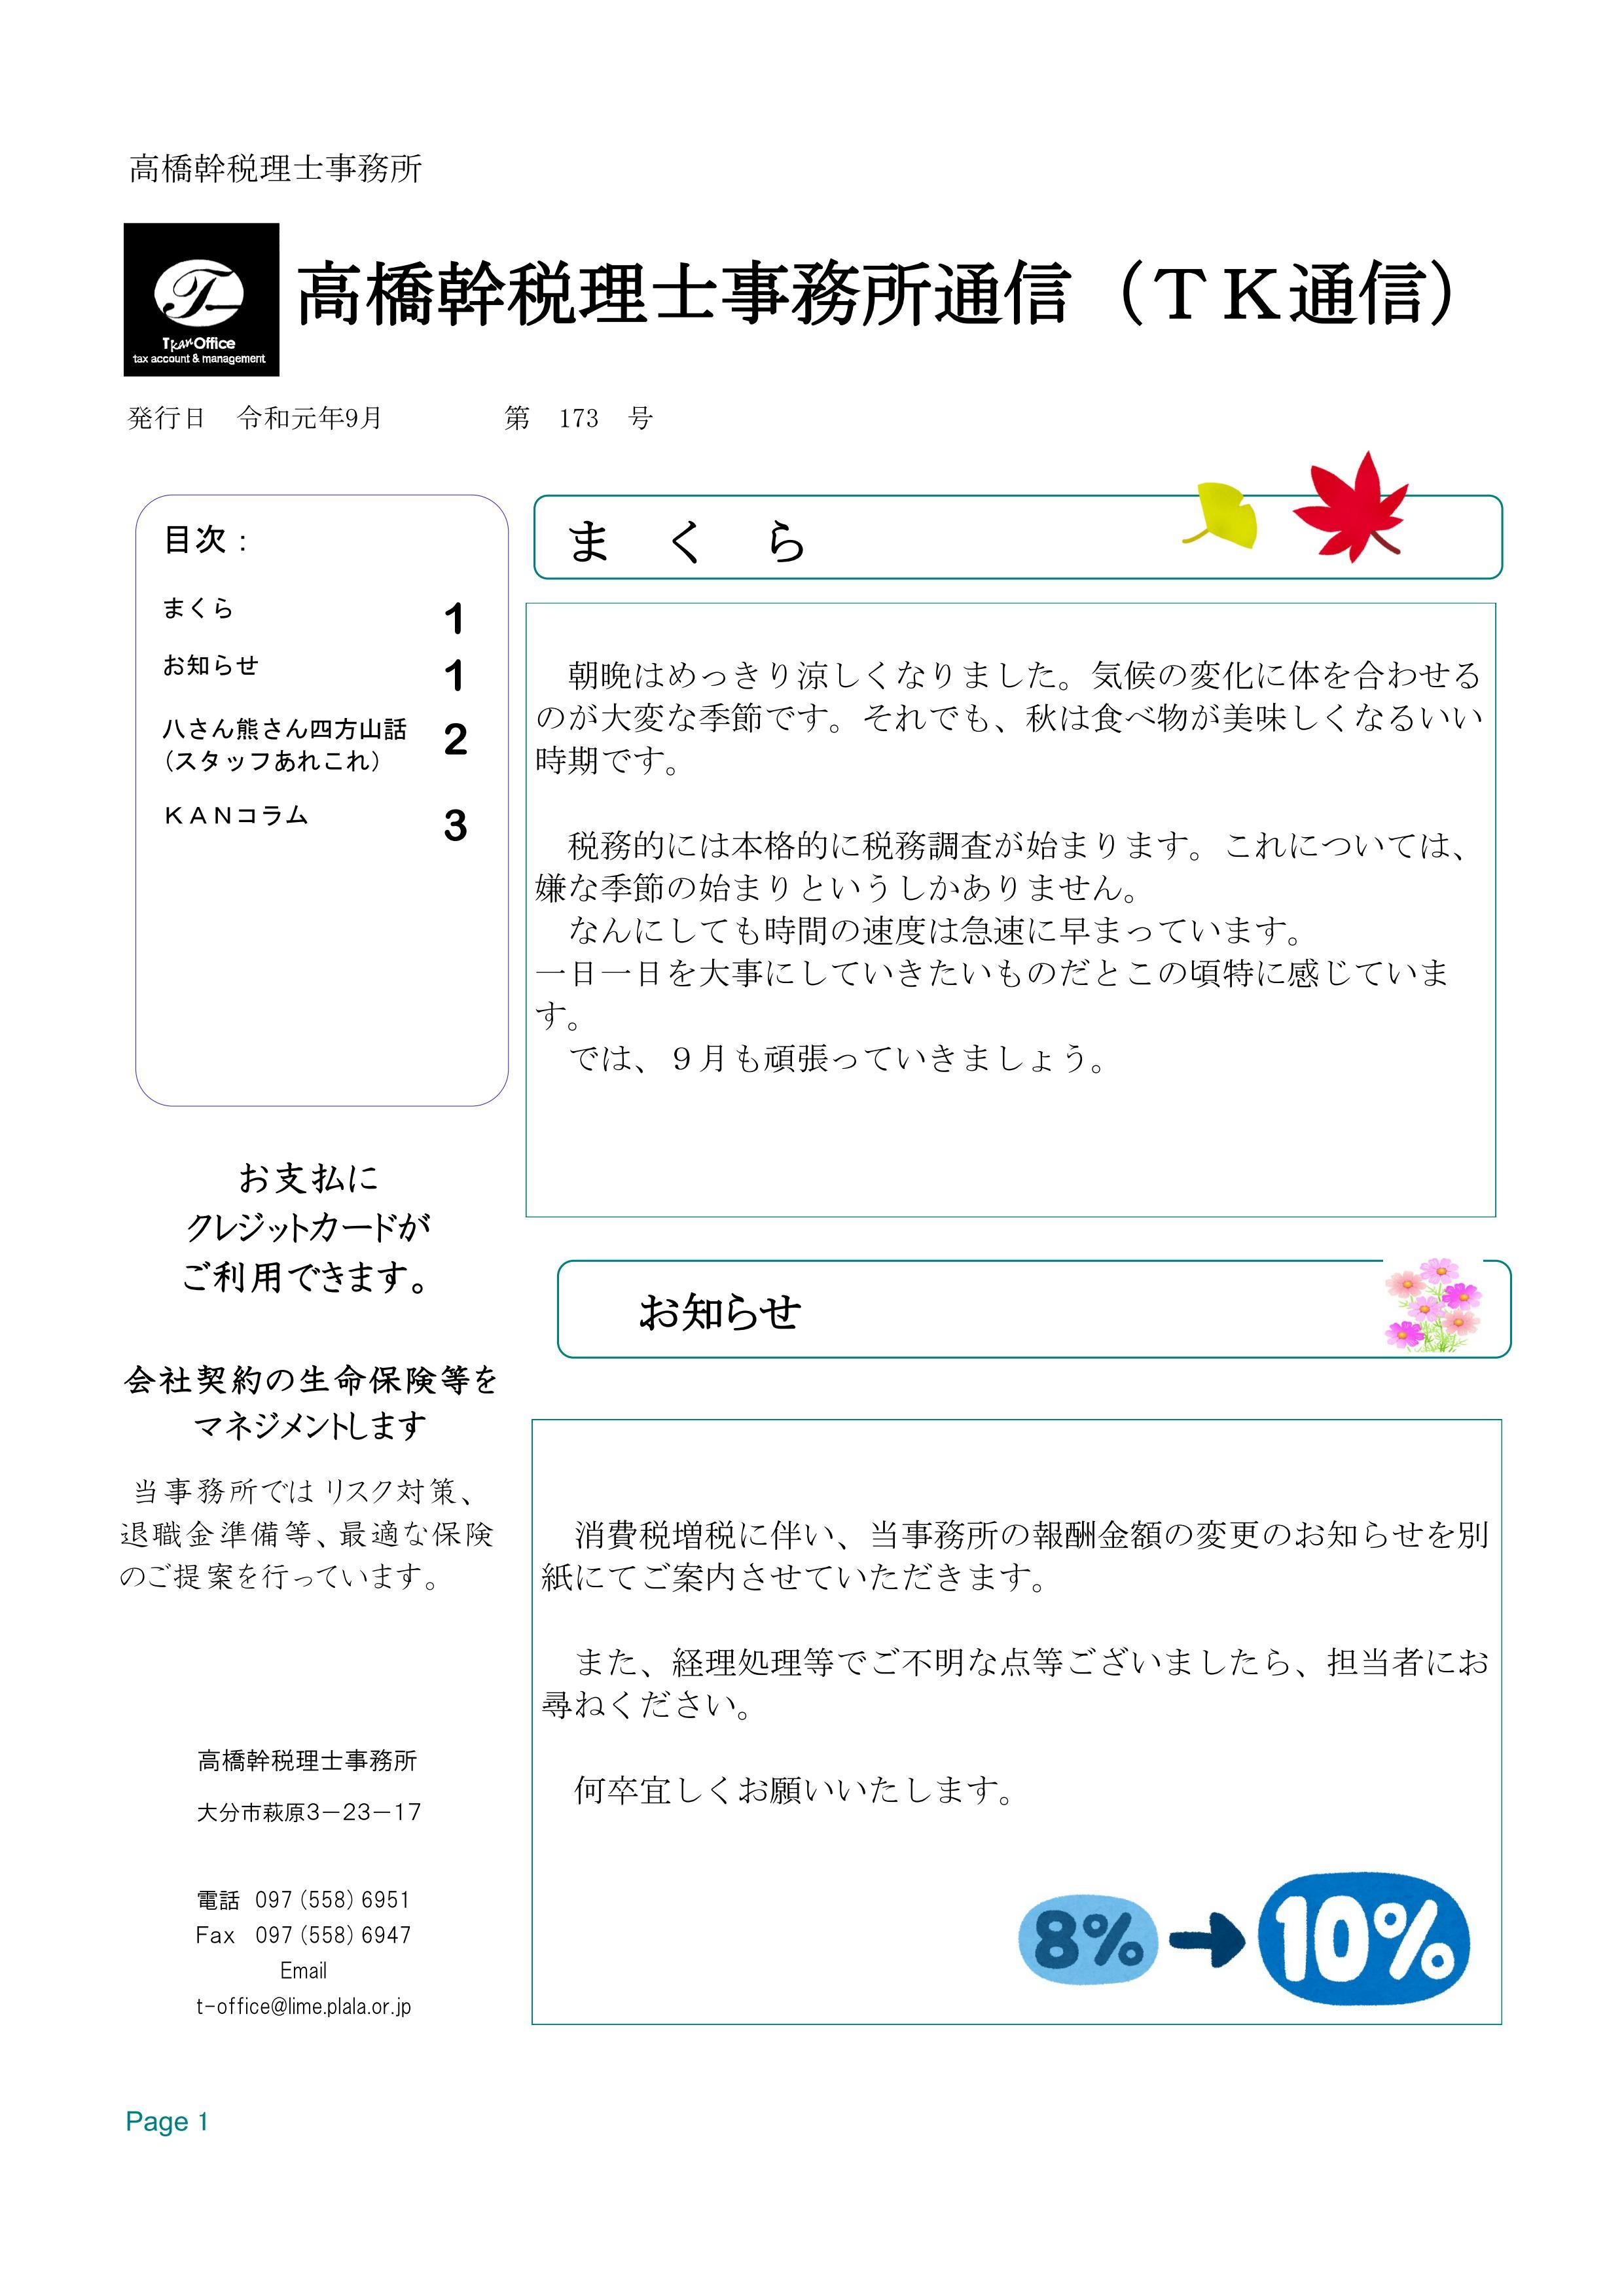 NLR1.09_01.jpg